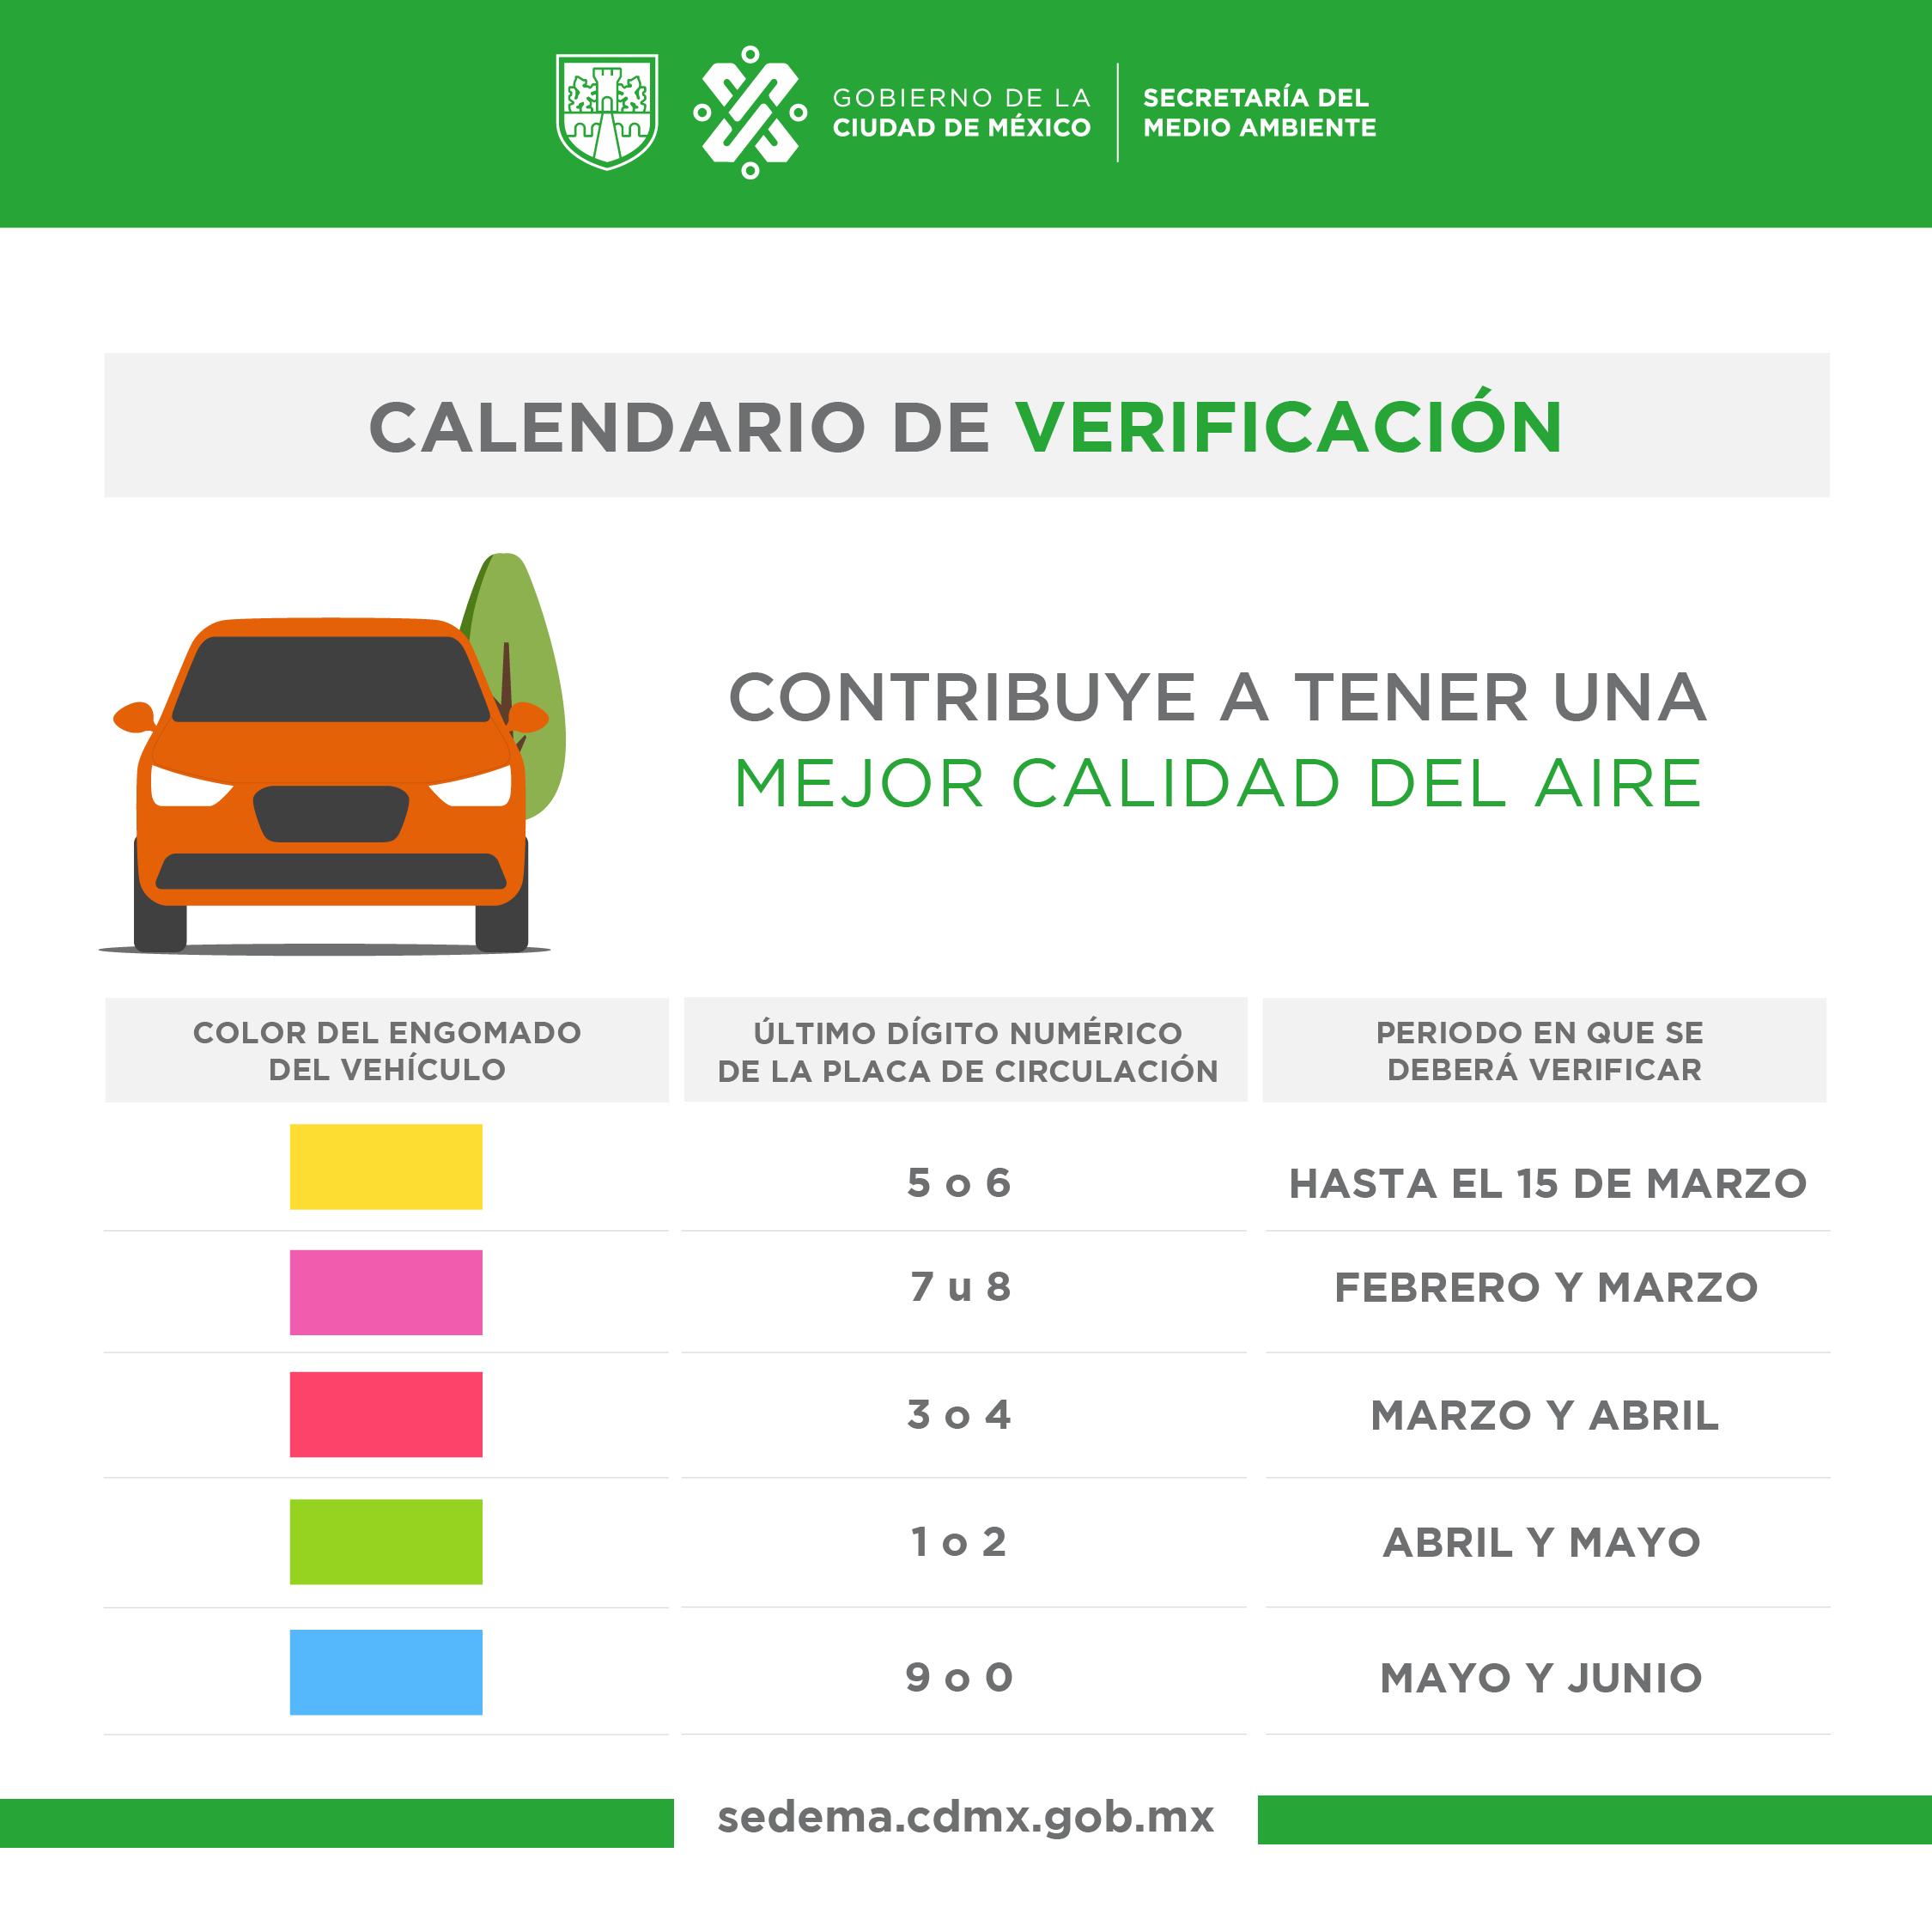 Calendario De Verificacion Fisico Mecanica 2019.Verificacion Vehicular Cdmx 2019 Que Cambios Habra